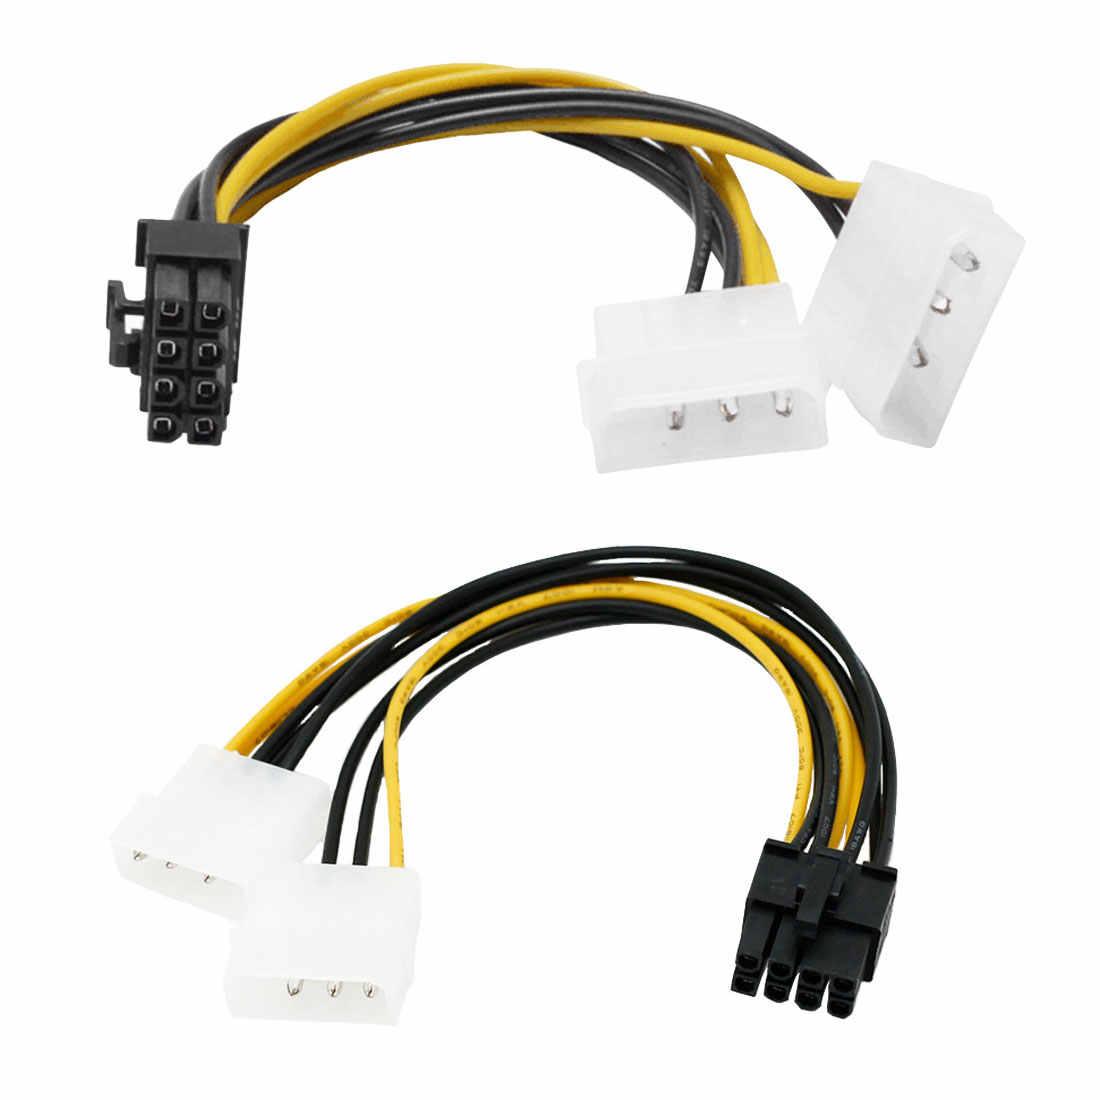 6 inç 8 Pin PCI Express erkek çift LP4 4Pin Molex IDE güç kablosu adaptörü kartı 20cm